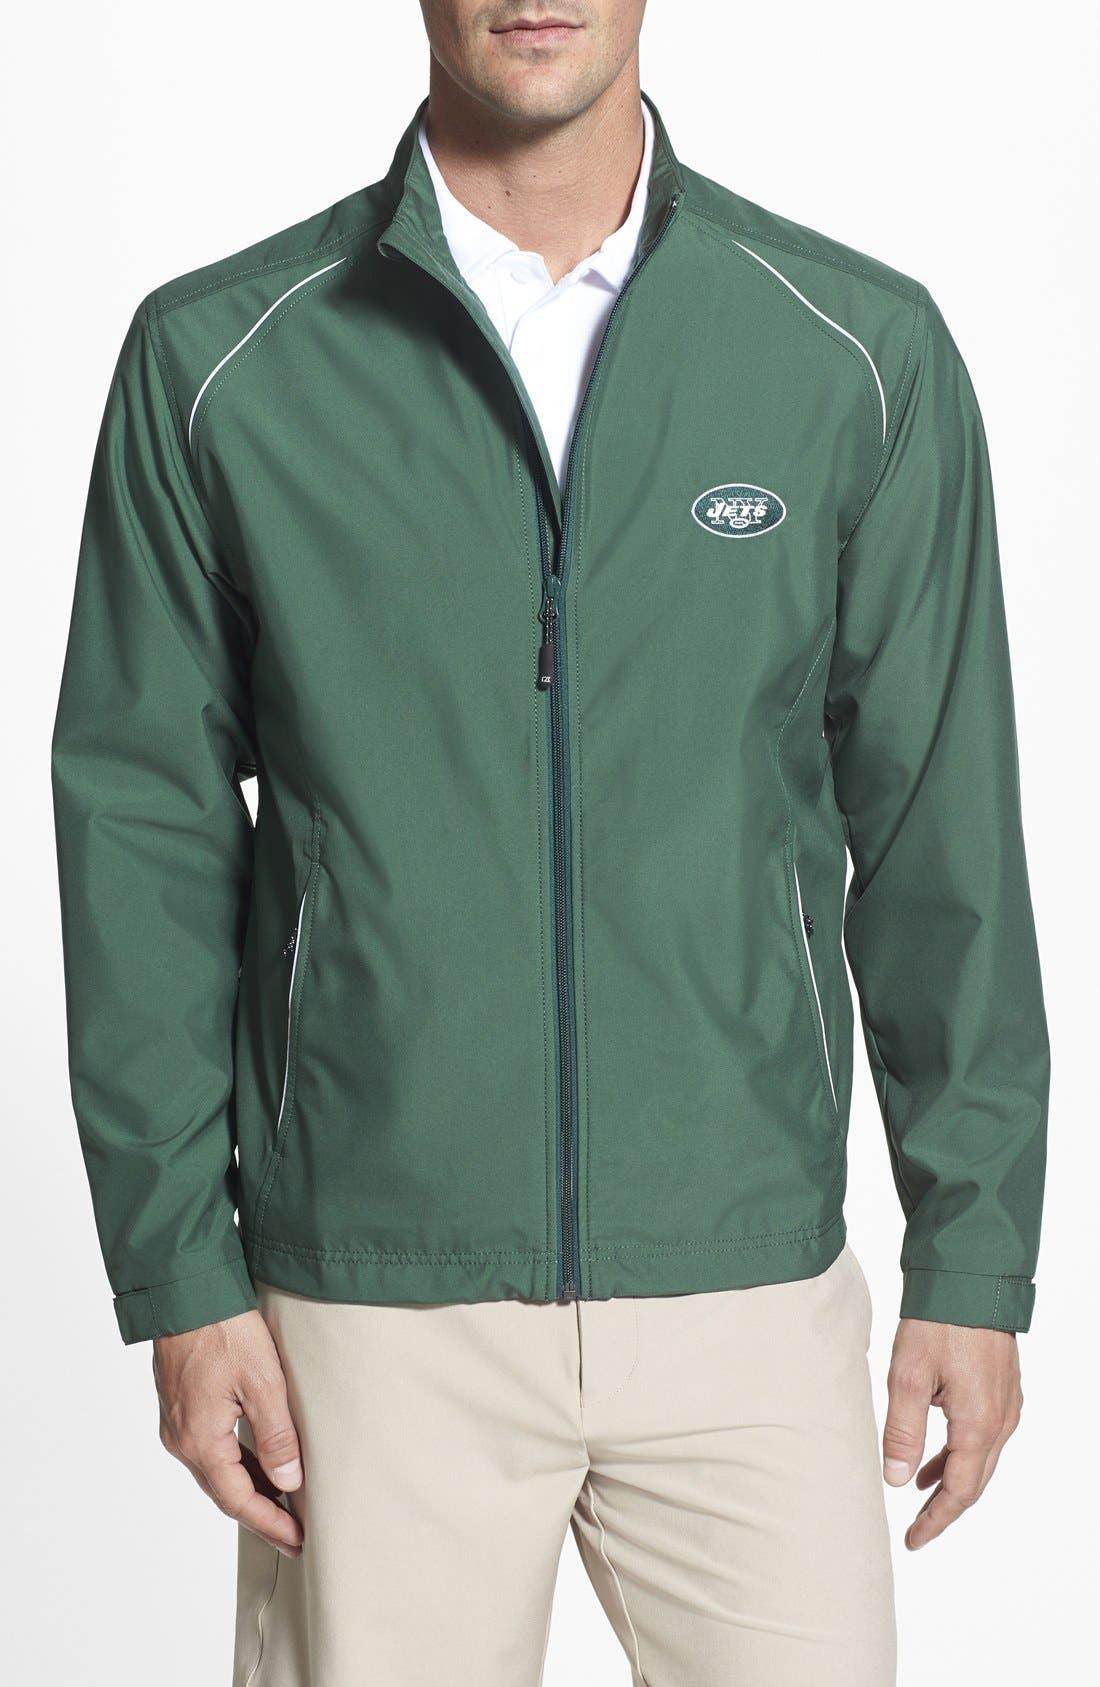 Cutter & Buck New York Jets - Beacon WeatherTec Wind & Water Resistant Jacket